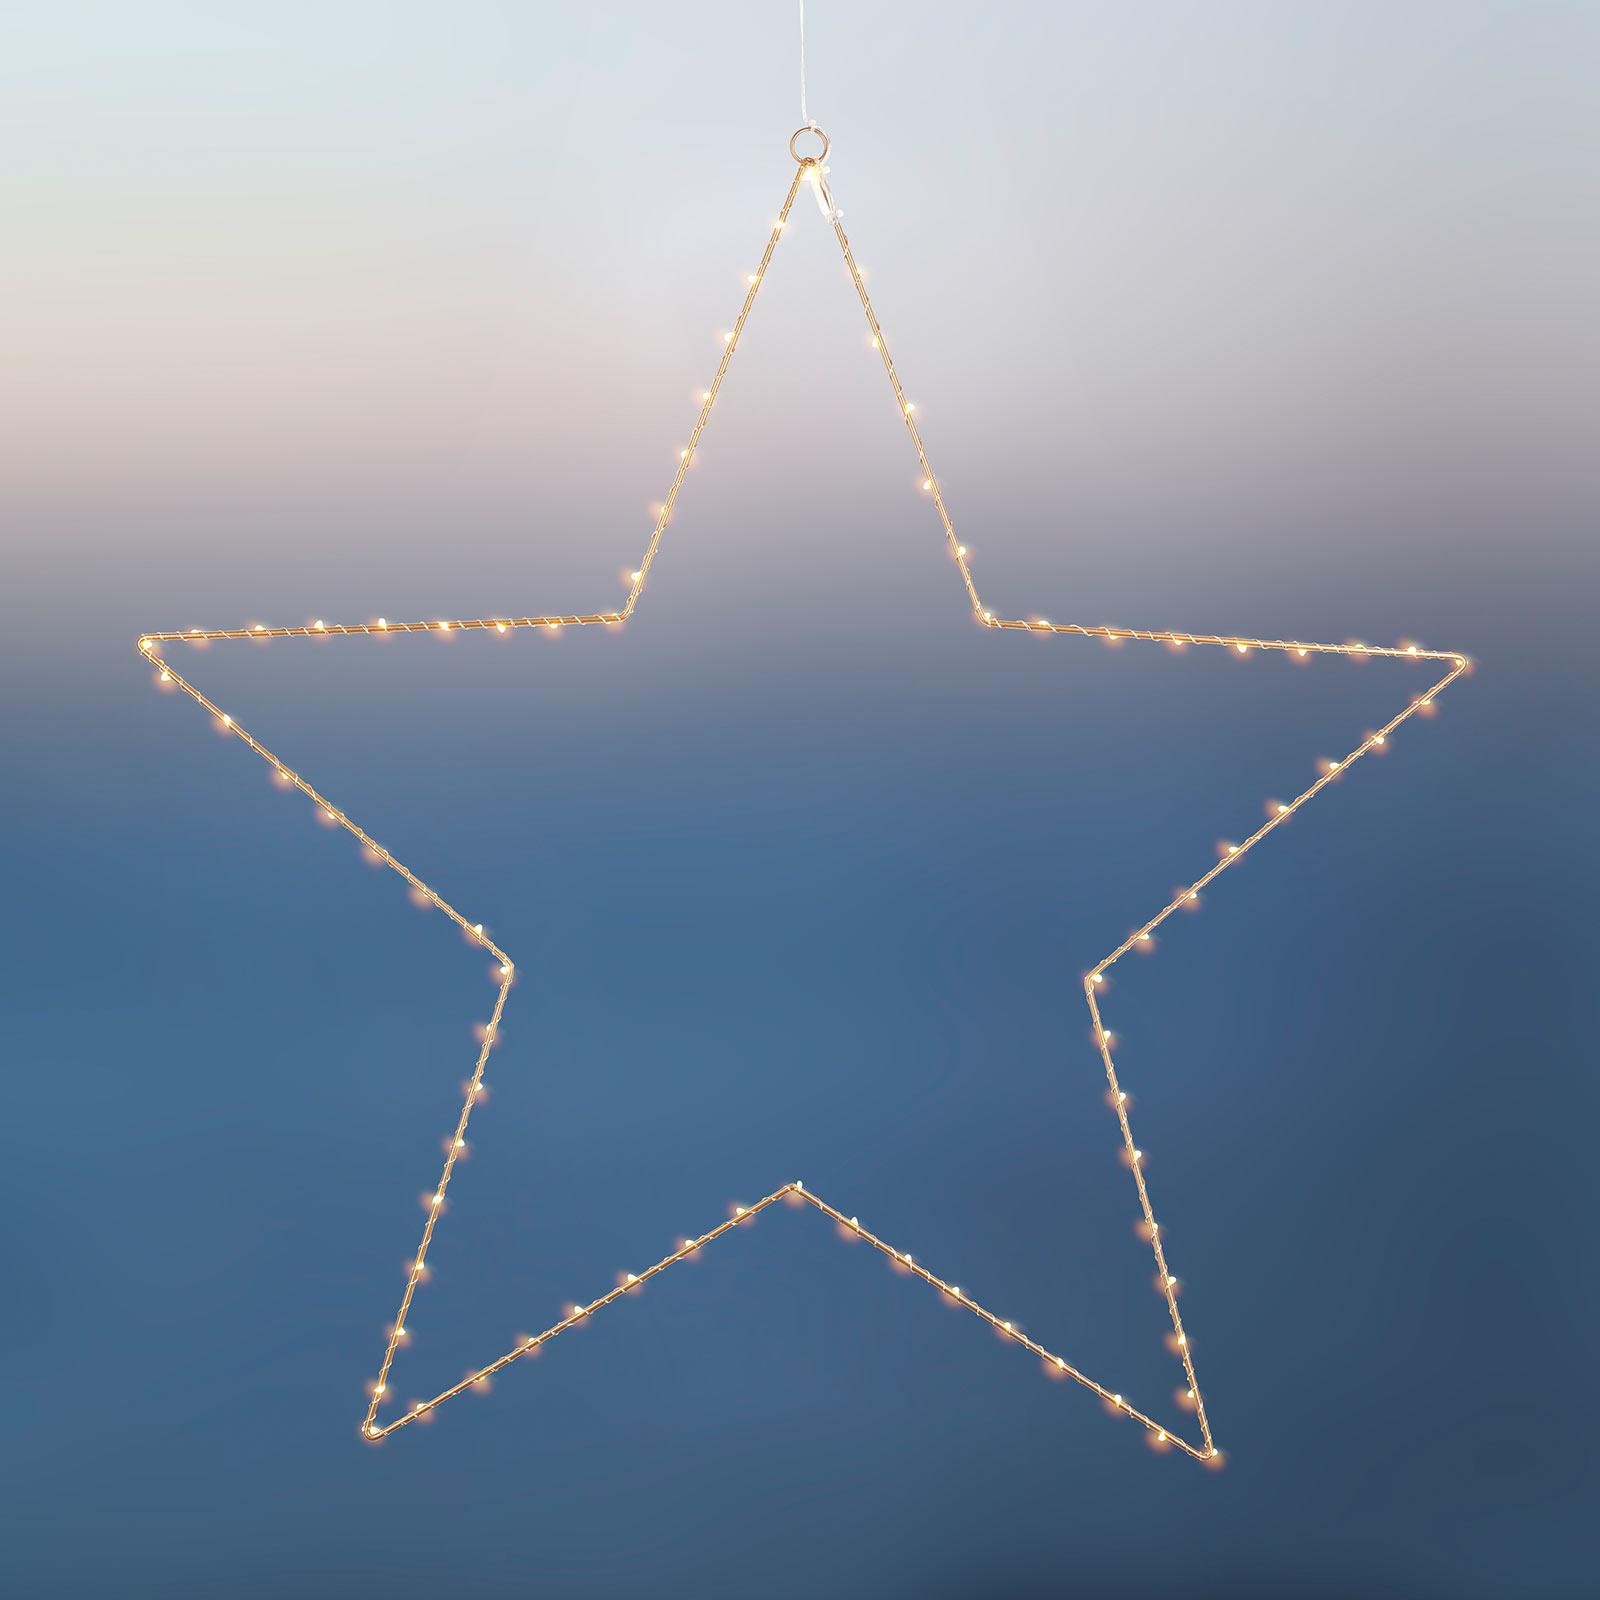 Stella decorativa LED Liva Star, oro, Ø 70 cm